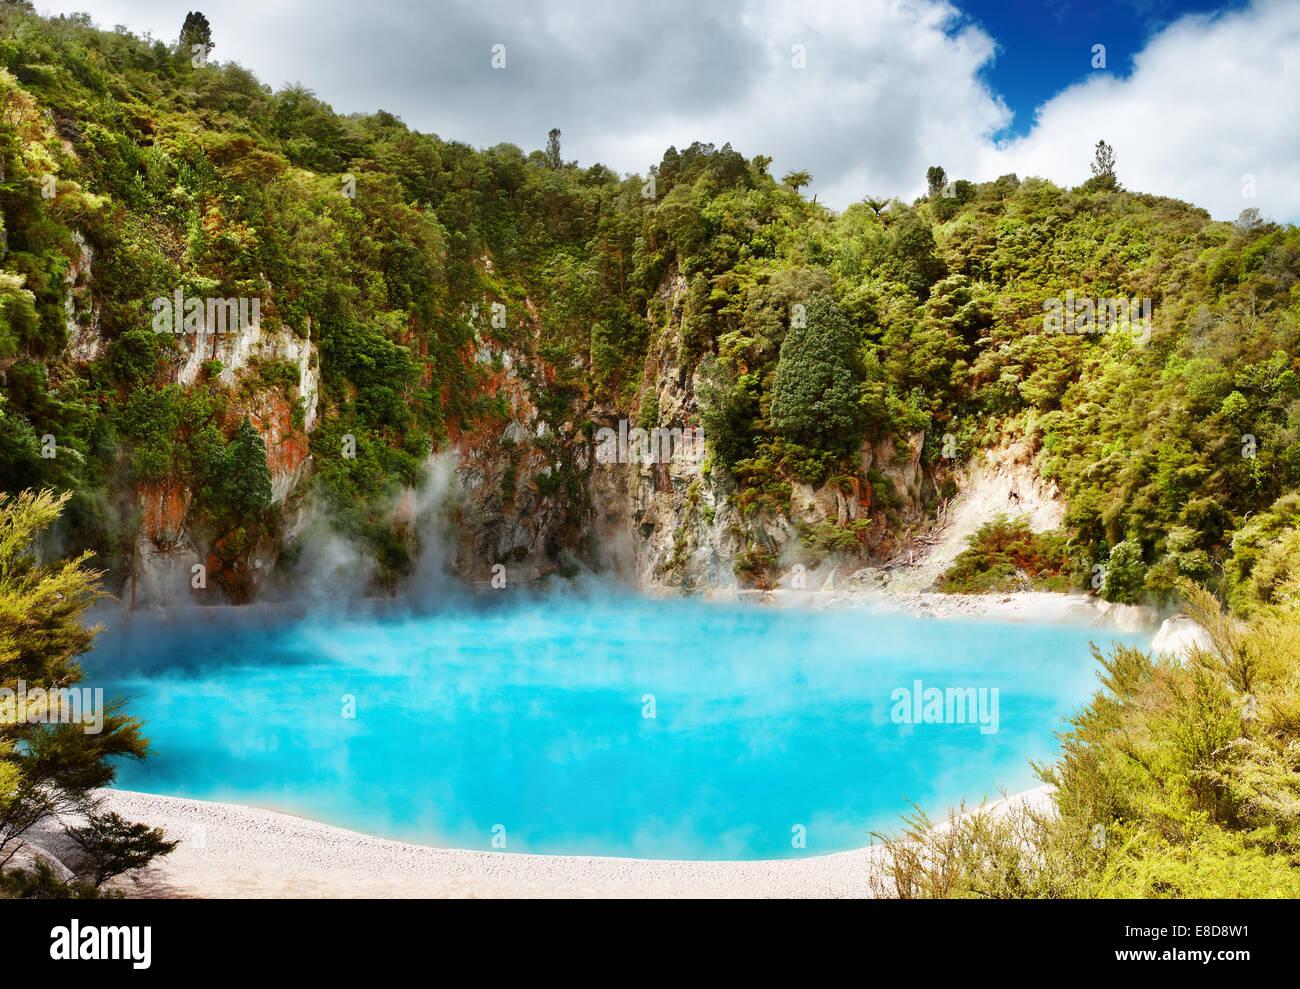 Inferno Crater Lake in Waimangu volcanic valley, New Zealand - Stock Image